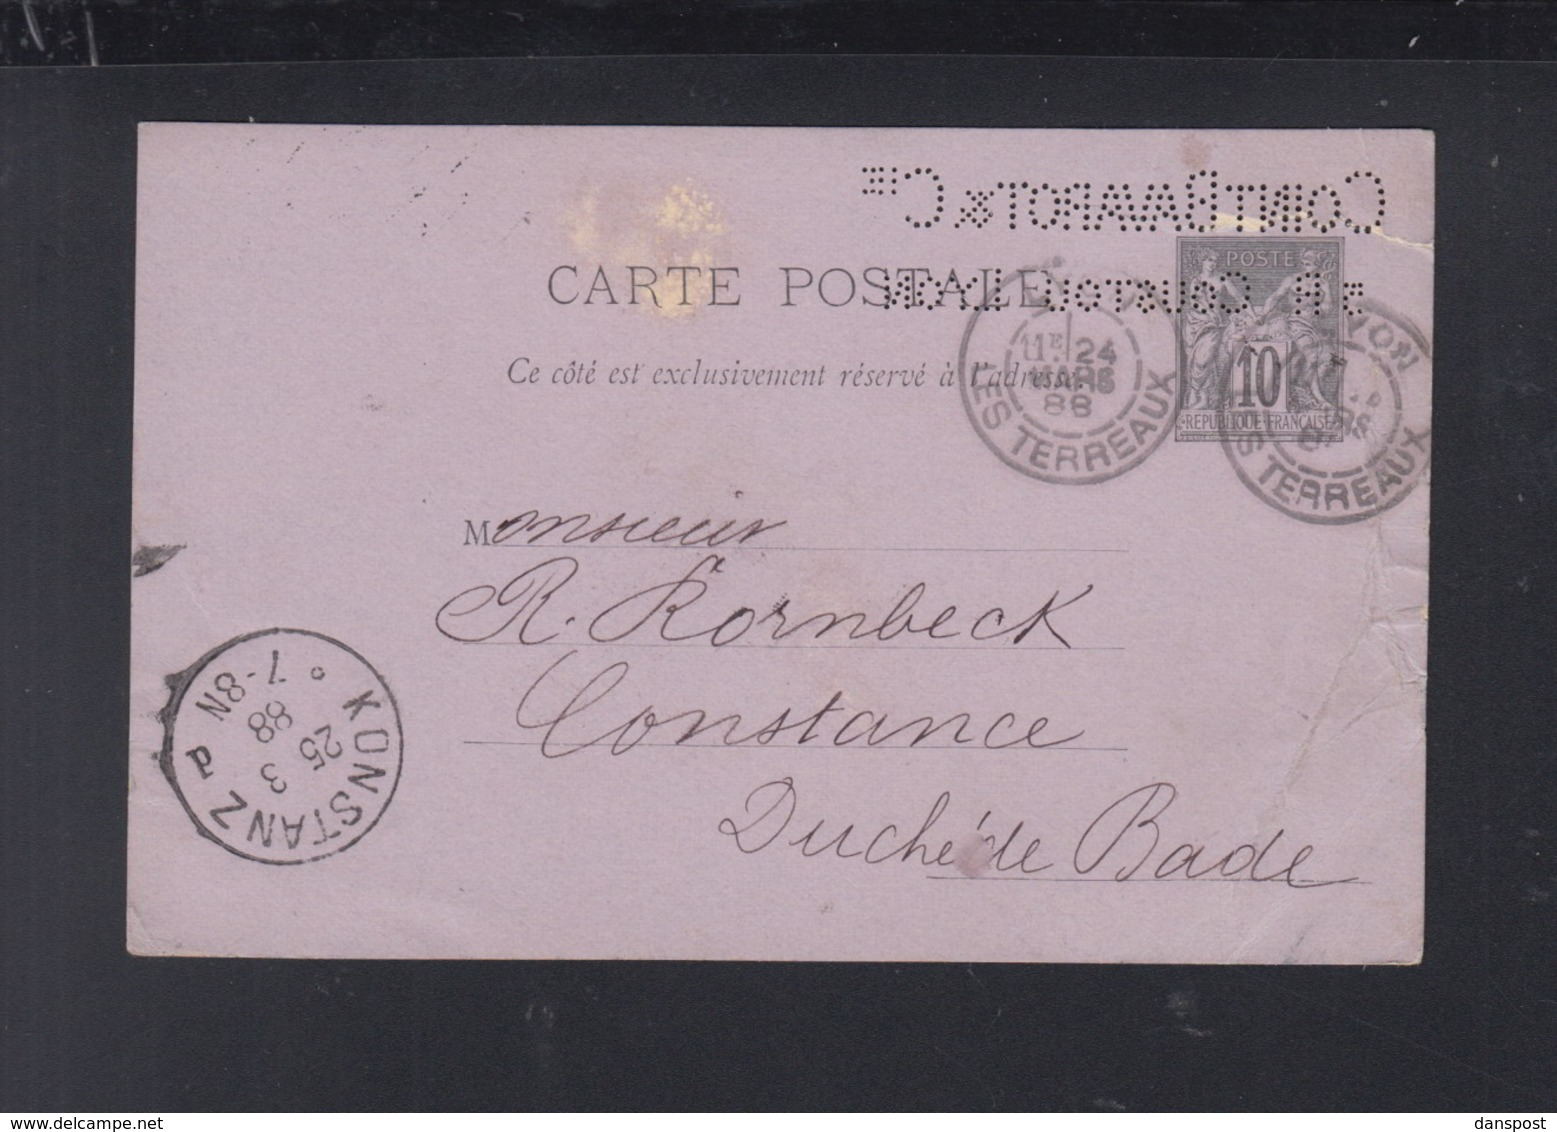 Frankreich France GSK 1888 Lyon Lochung Perfin Coint Bavarot & Cie - Biglietto Postale